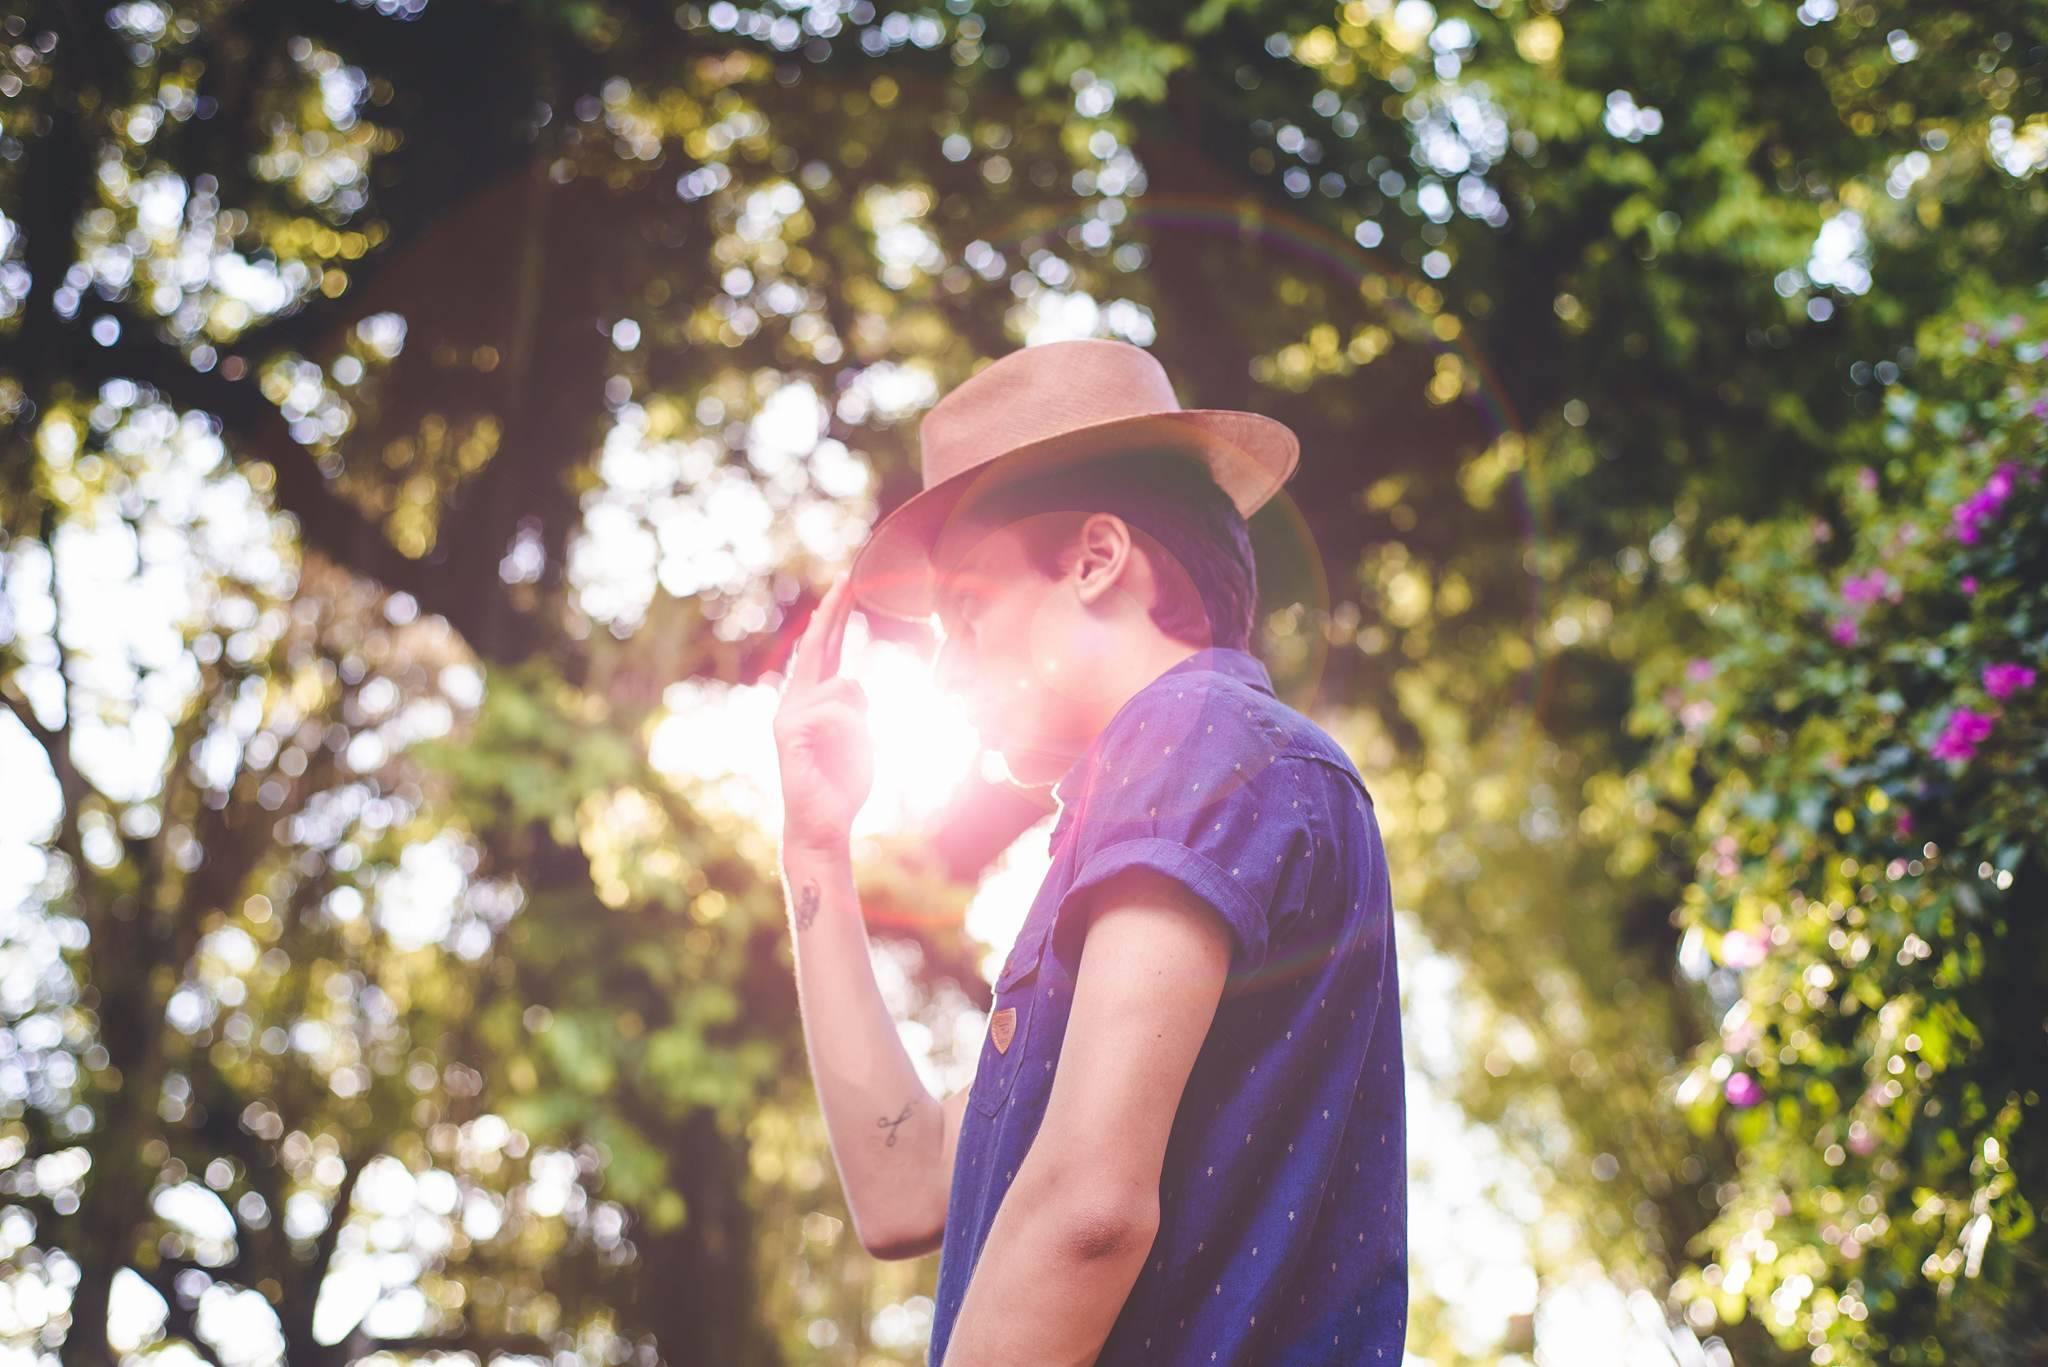 alex-cursino-blogueiro-de-moda-fashion-blogger-youtuber-youtuber-de-moda-canal-de-moda-moda-sem-censura-blogger-digital-infuencer-content-creator-chapeu-masculino-bata-masculina-roupa-2017